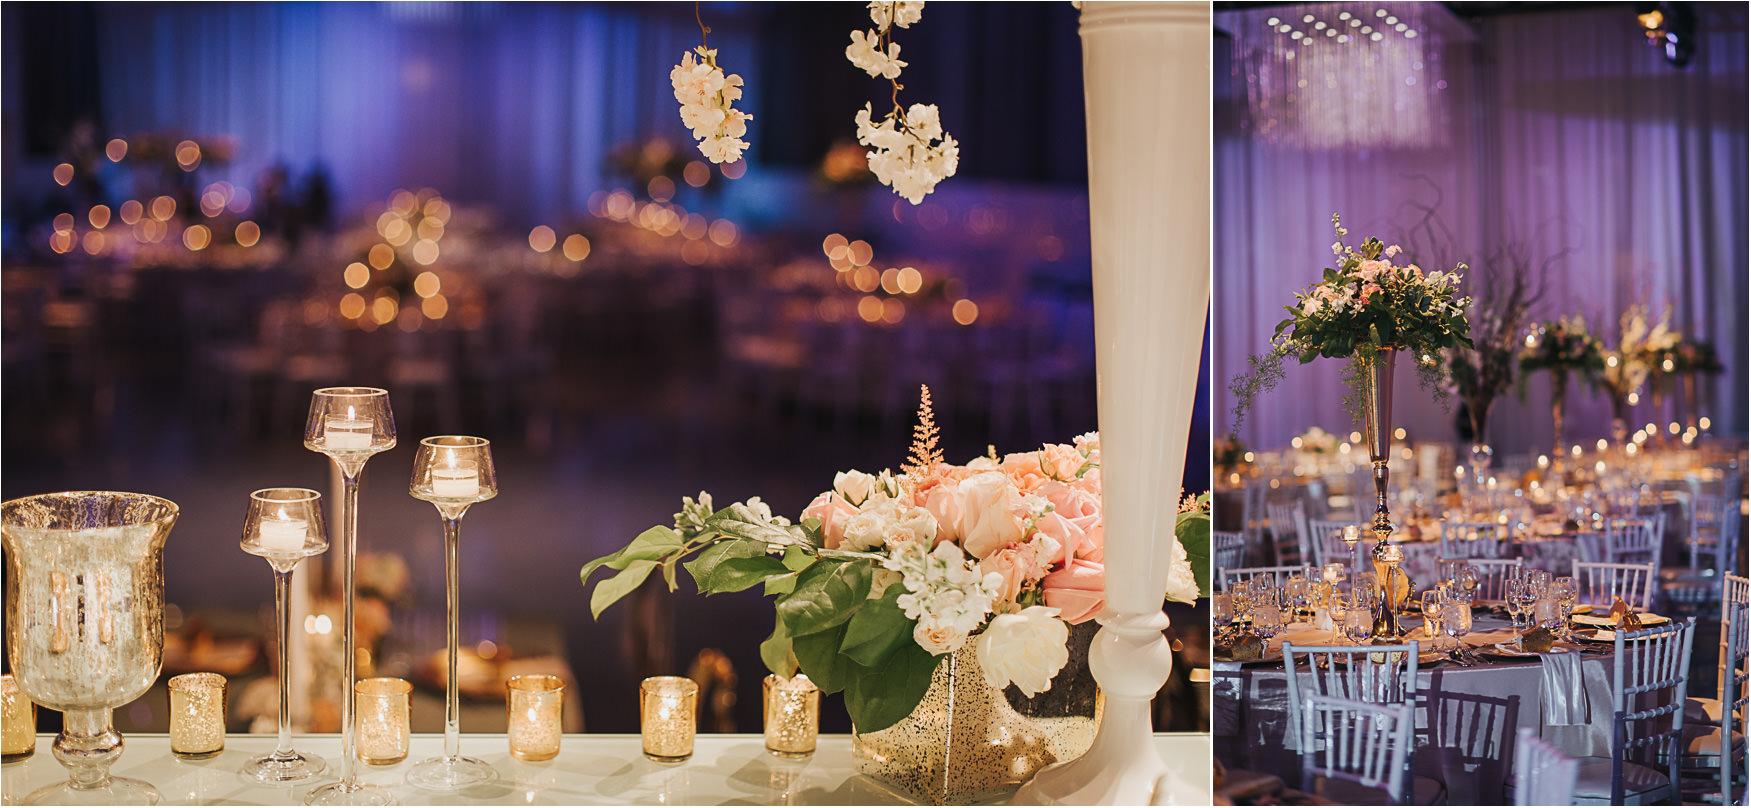 Liberty Grand Artifacts Room Wedding Reception Florals